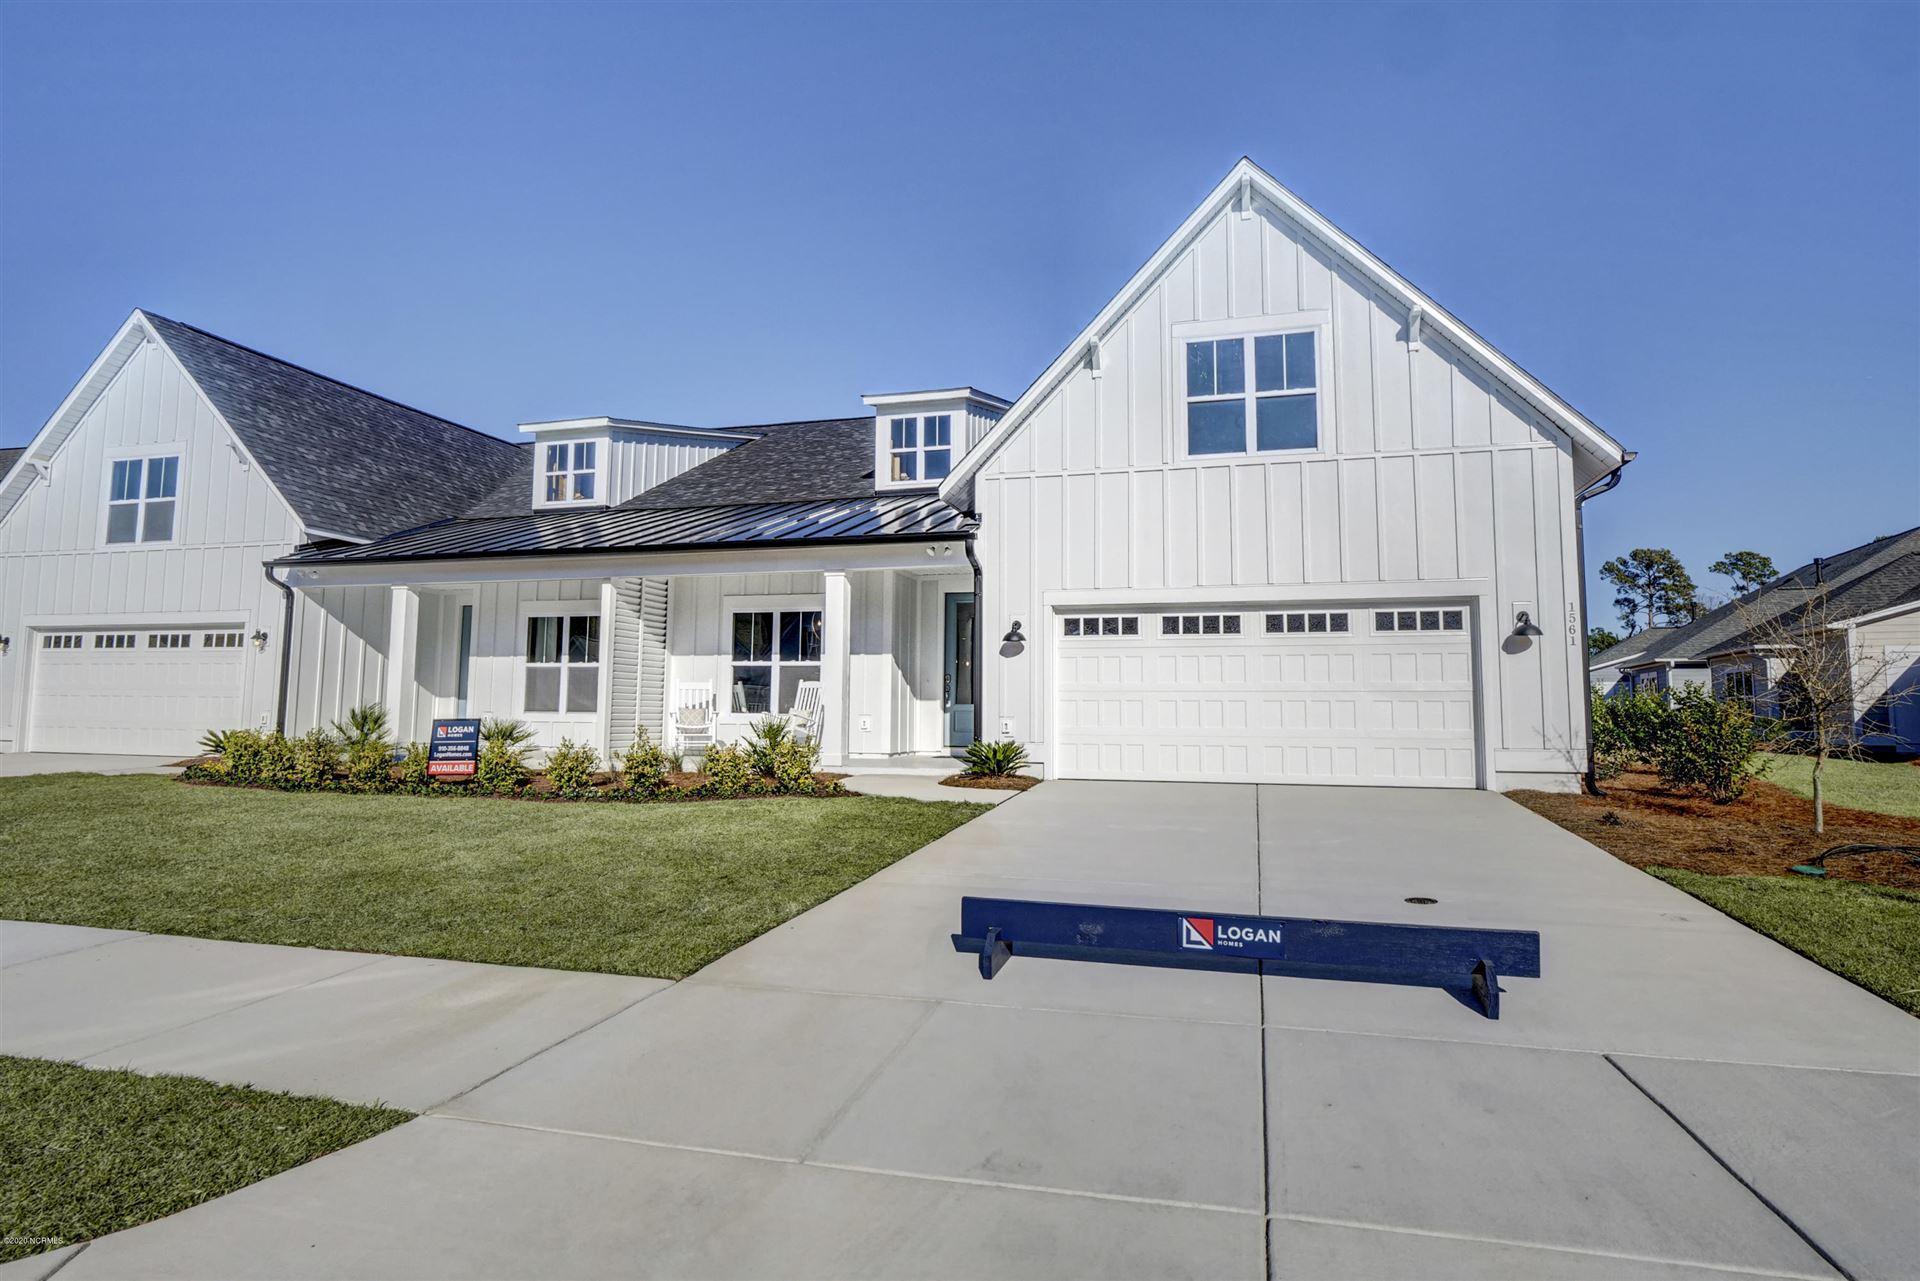 1561 Sand Harbor Circle, Ocean Isle Beach, NC 28469 - MLS#: 100194272